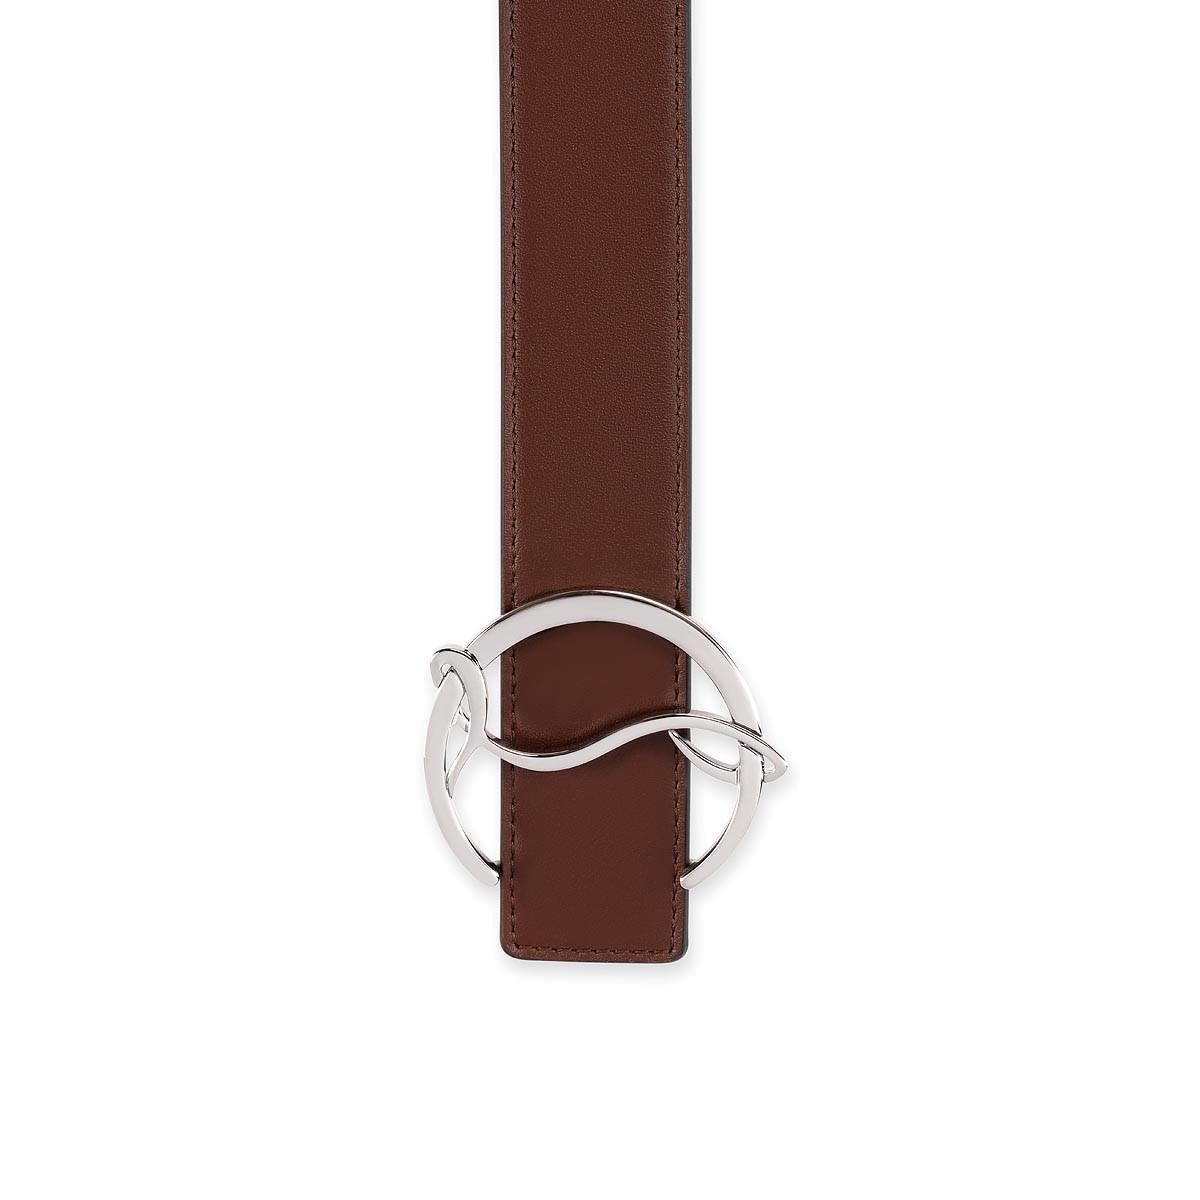 Belt - W Cl Logo Belt - Christian Louboutin